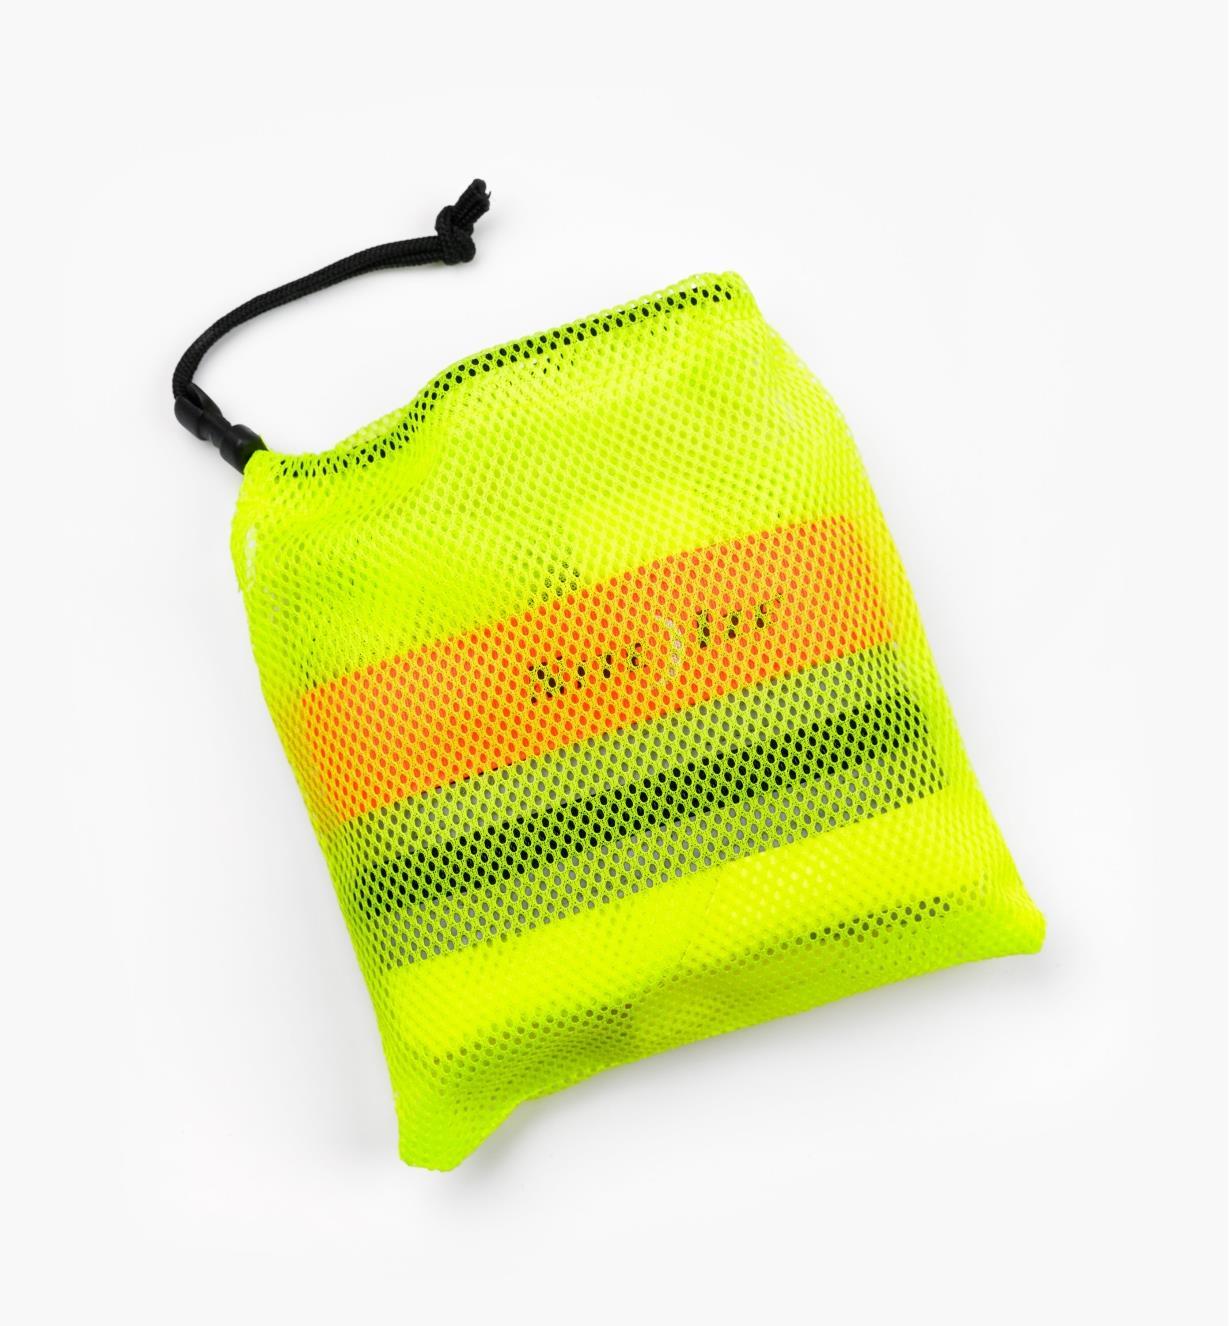 68K0902 - High-Visibility LED Vest, Lg/XL